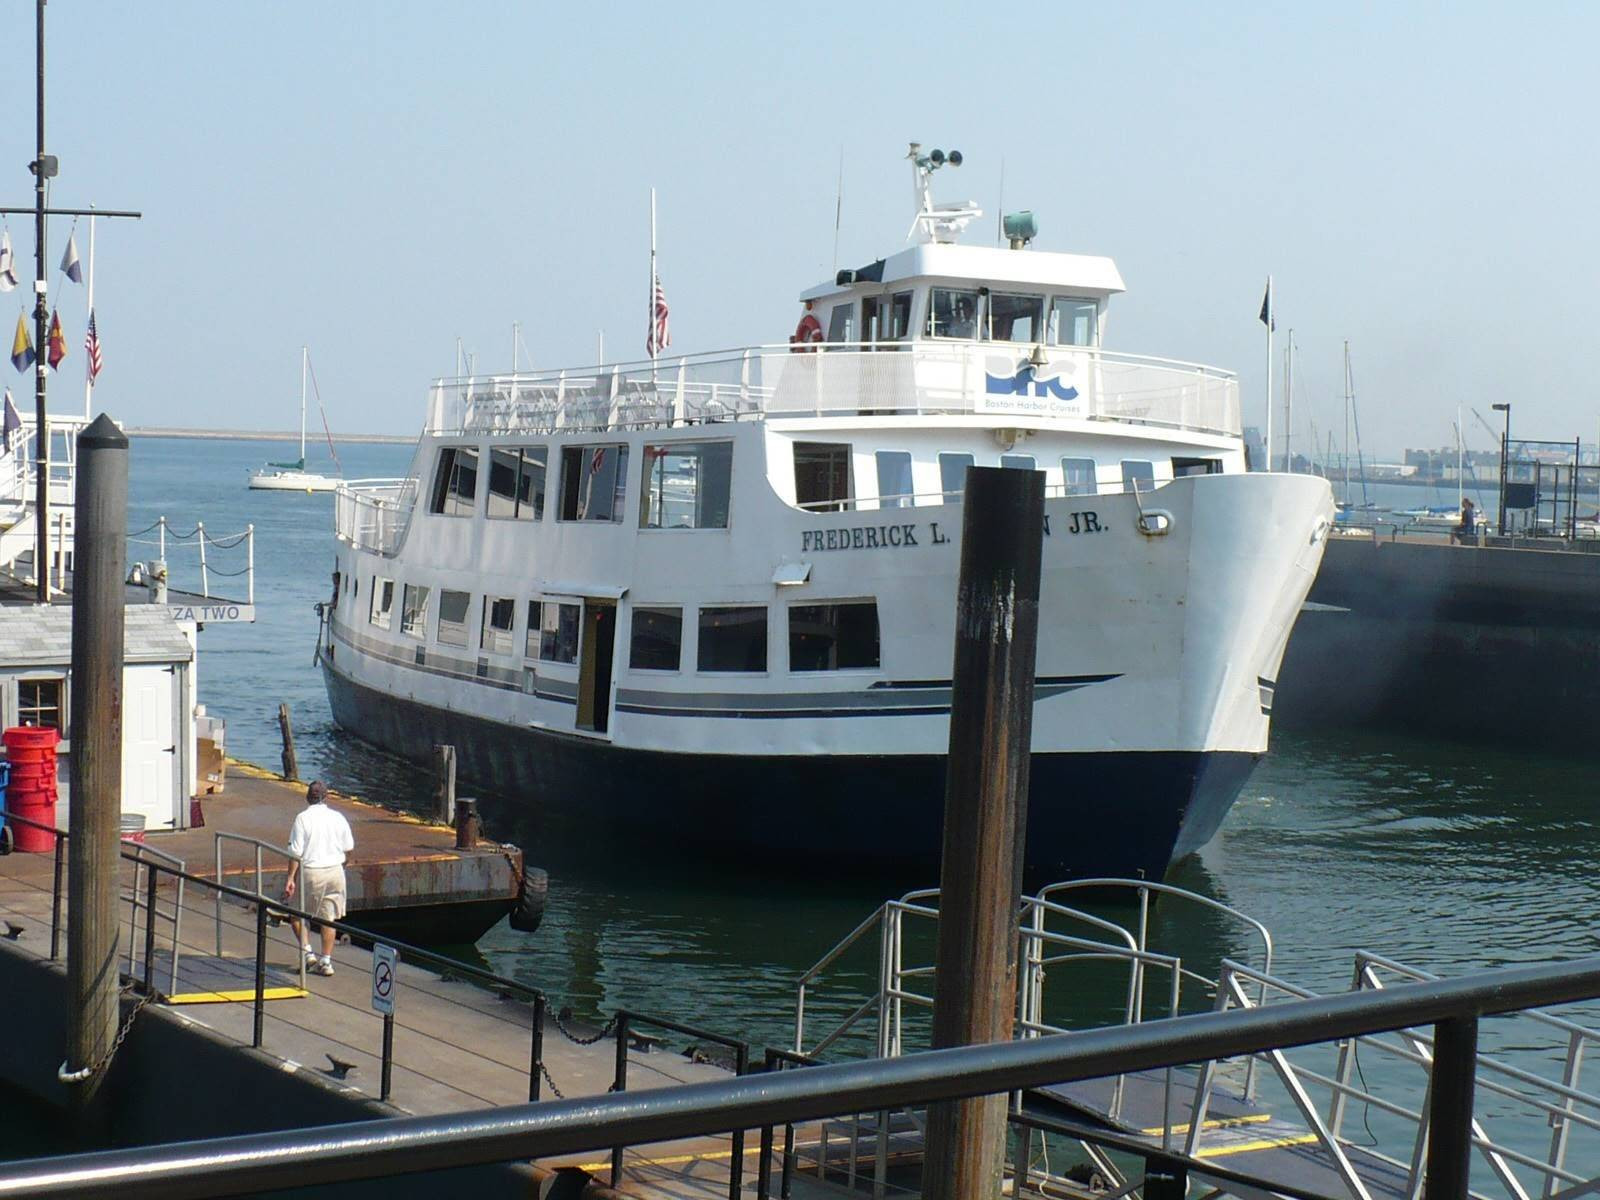 Boston Harbor Dinner Cruises  Boston Harbor Dinner Dance Cruise Tours4Fun